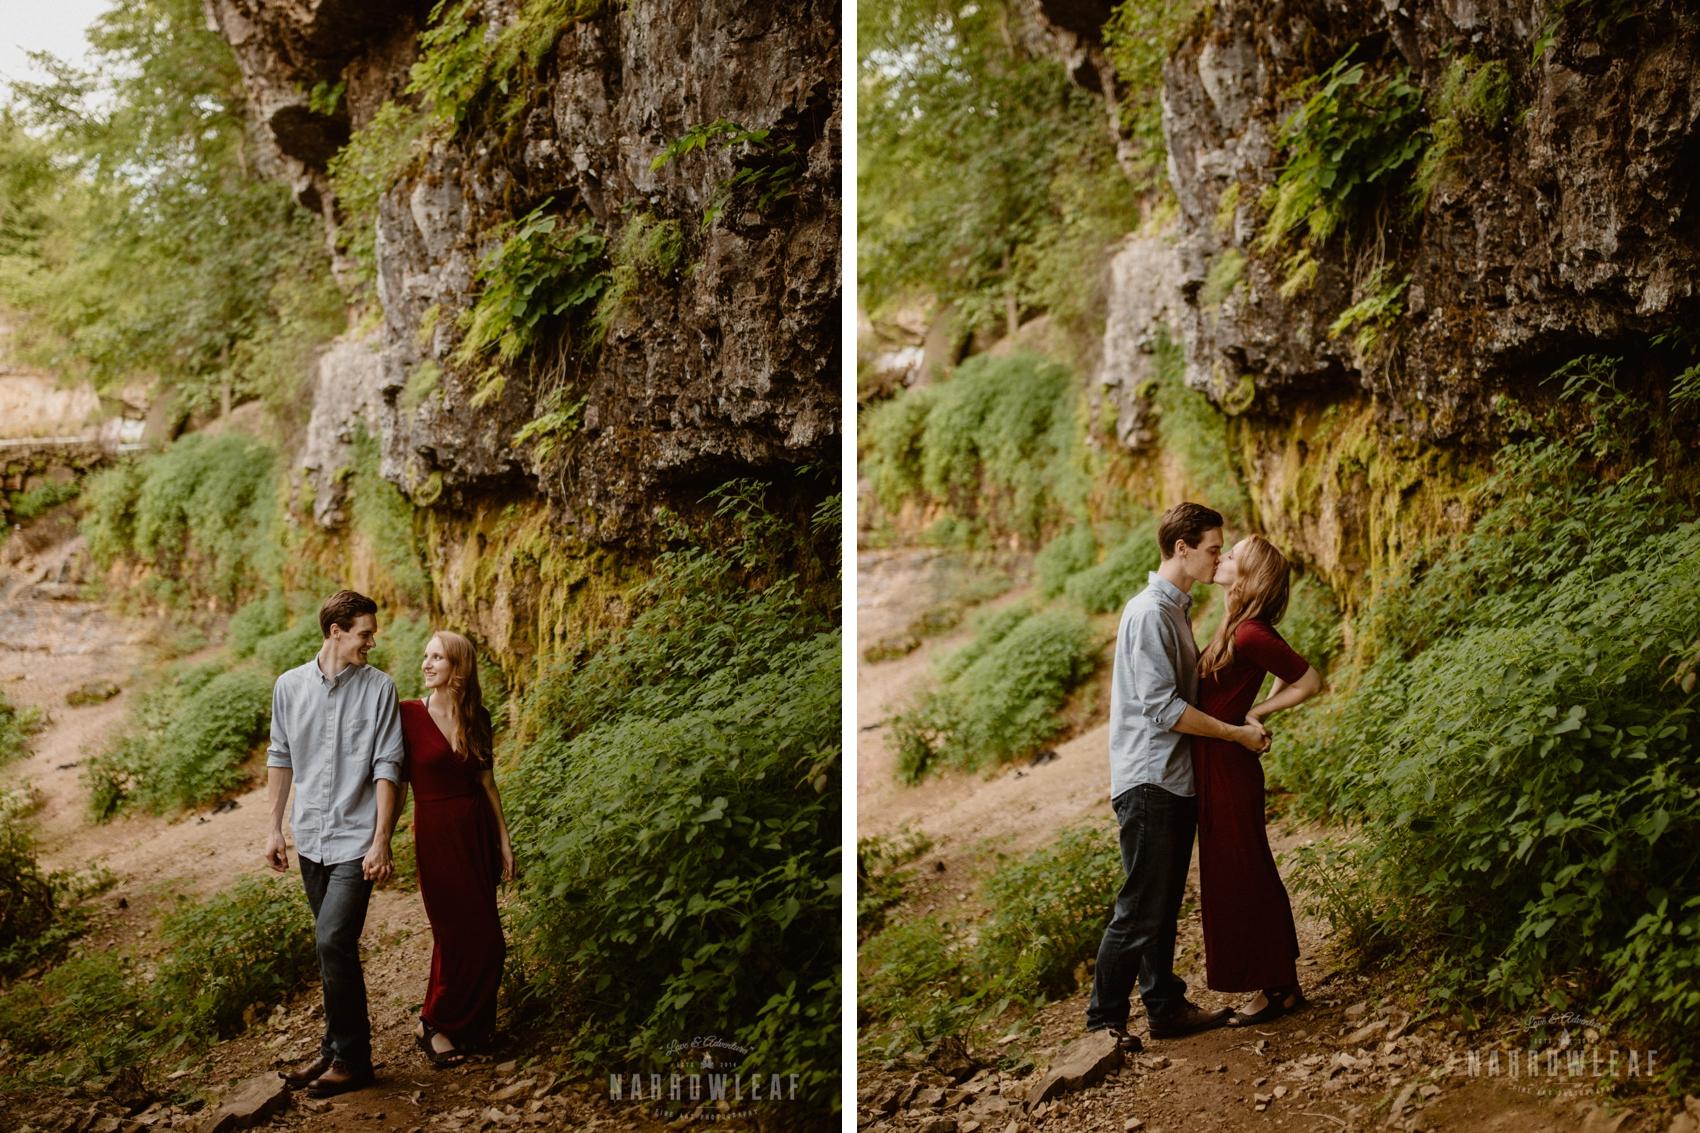 willow-falls-waterfall-adventure-engagement-photographer-005-006.jpg